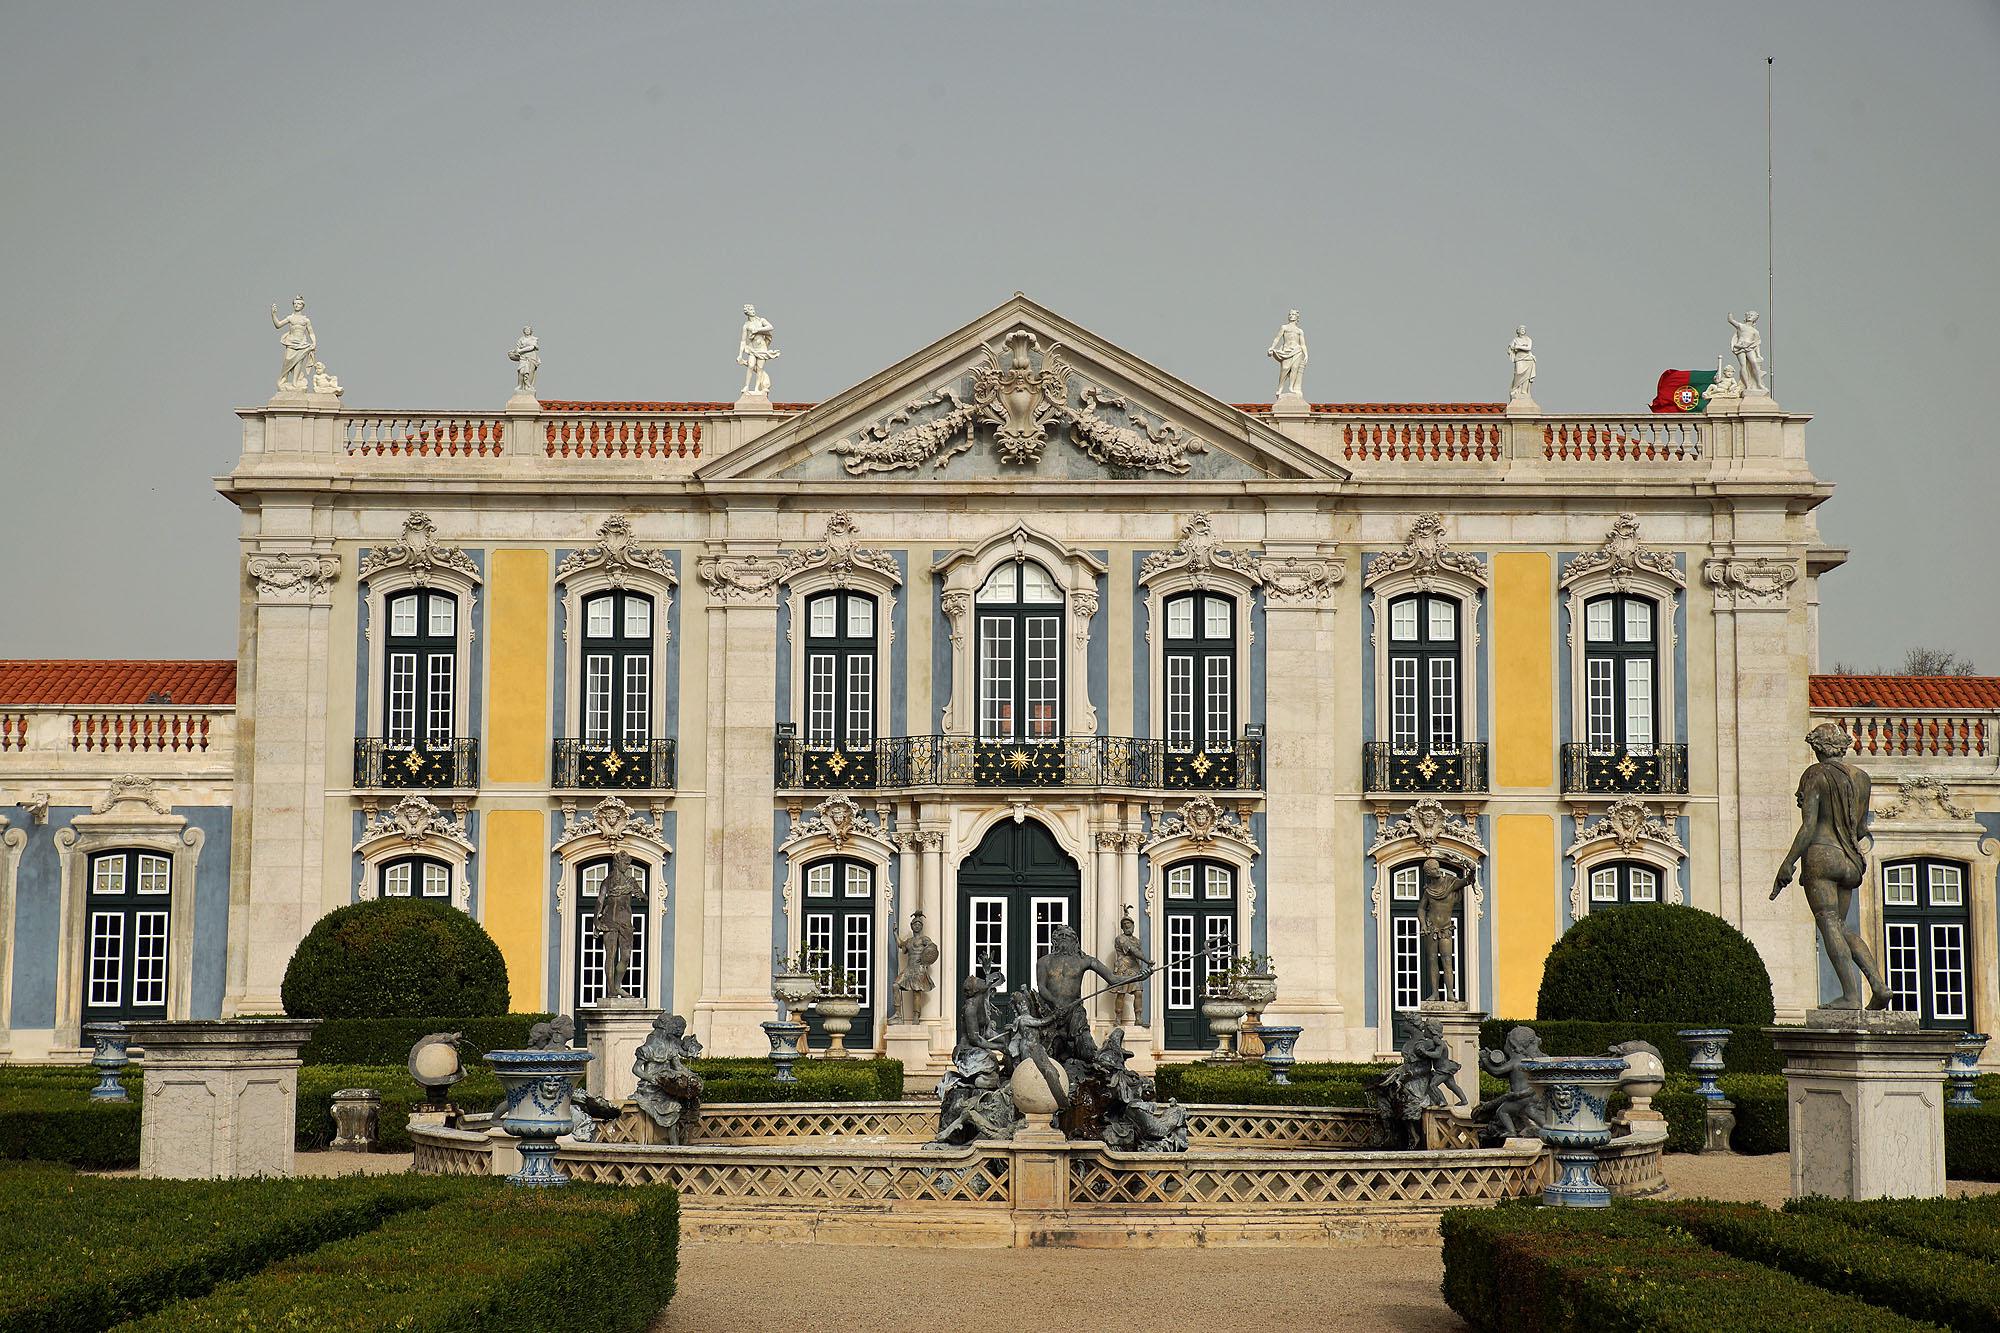 File:Palácio Nacional de Queluz DSC04937 - QUELUZ (32558819844).jpg -  Wikimedia Commons